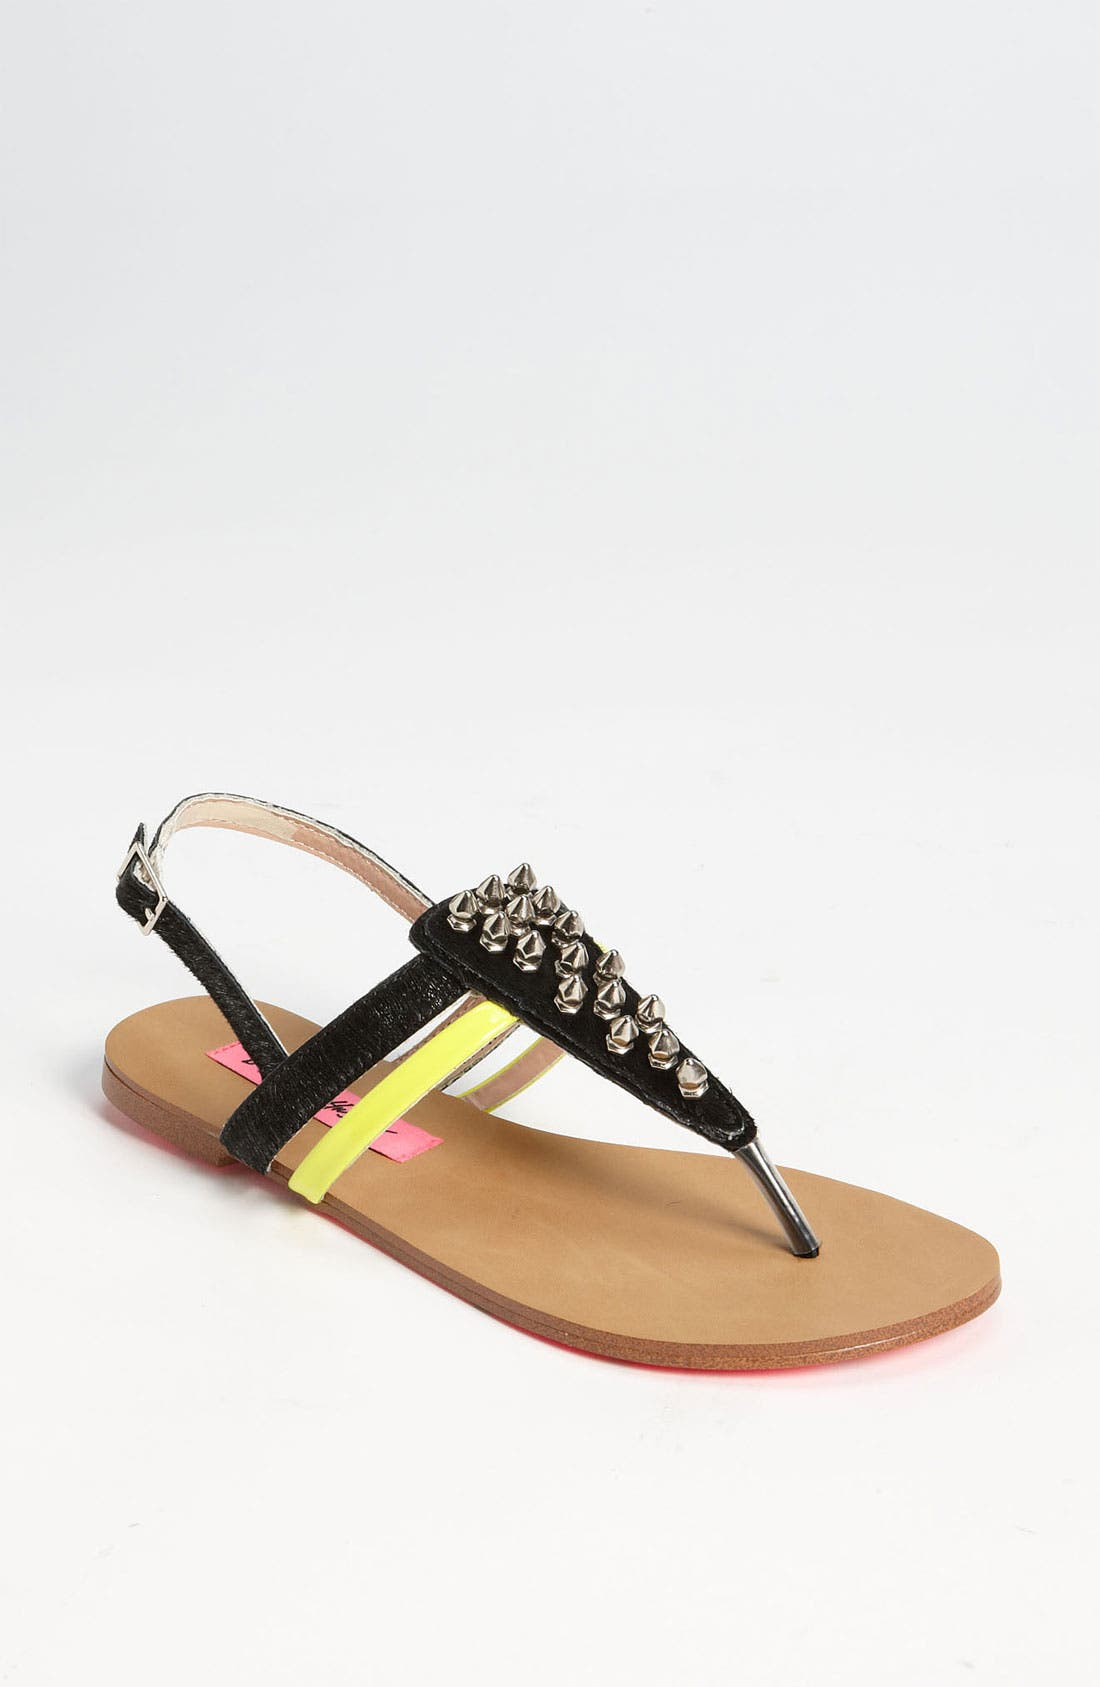 Alternate Image 1 Selected - Betsey Johnson 'Corii' Sandal